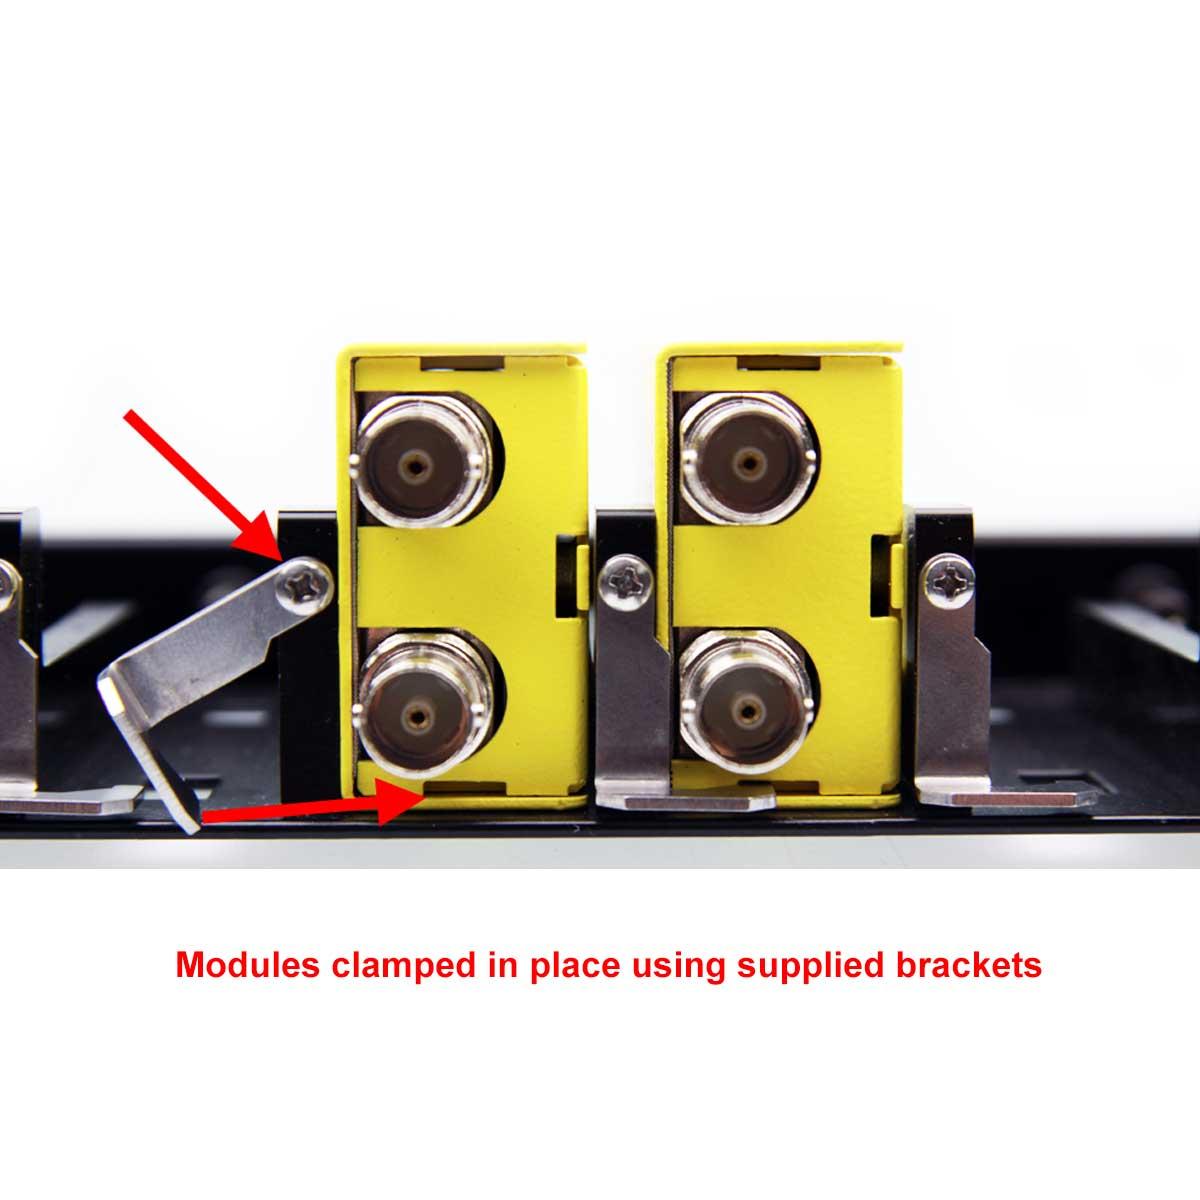 RFR 1000 yellobrik module bracket use